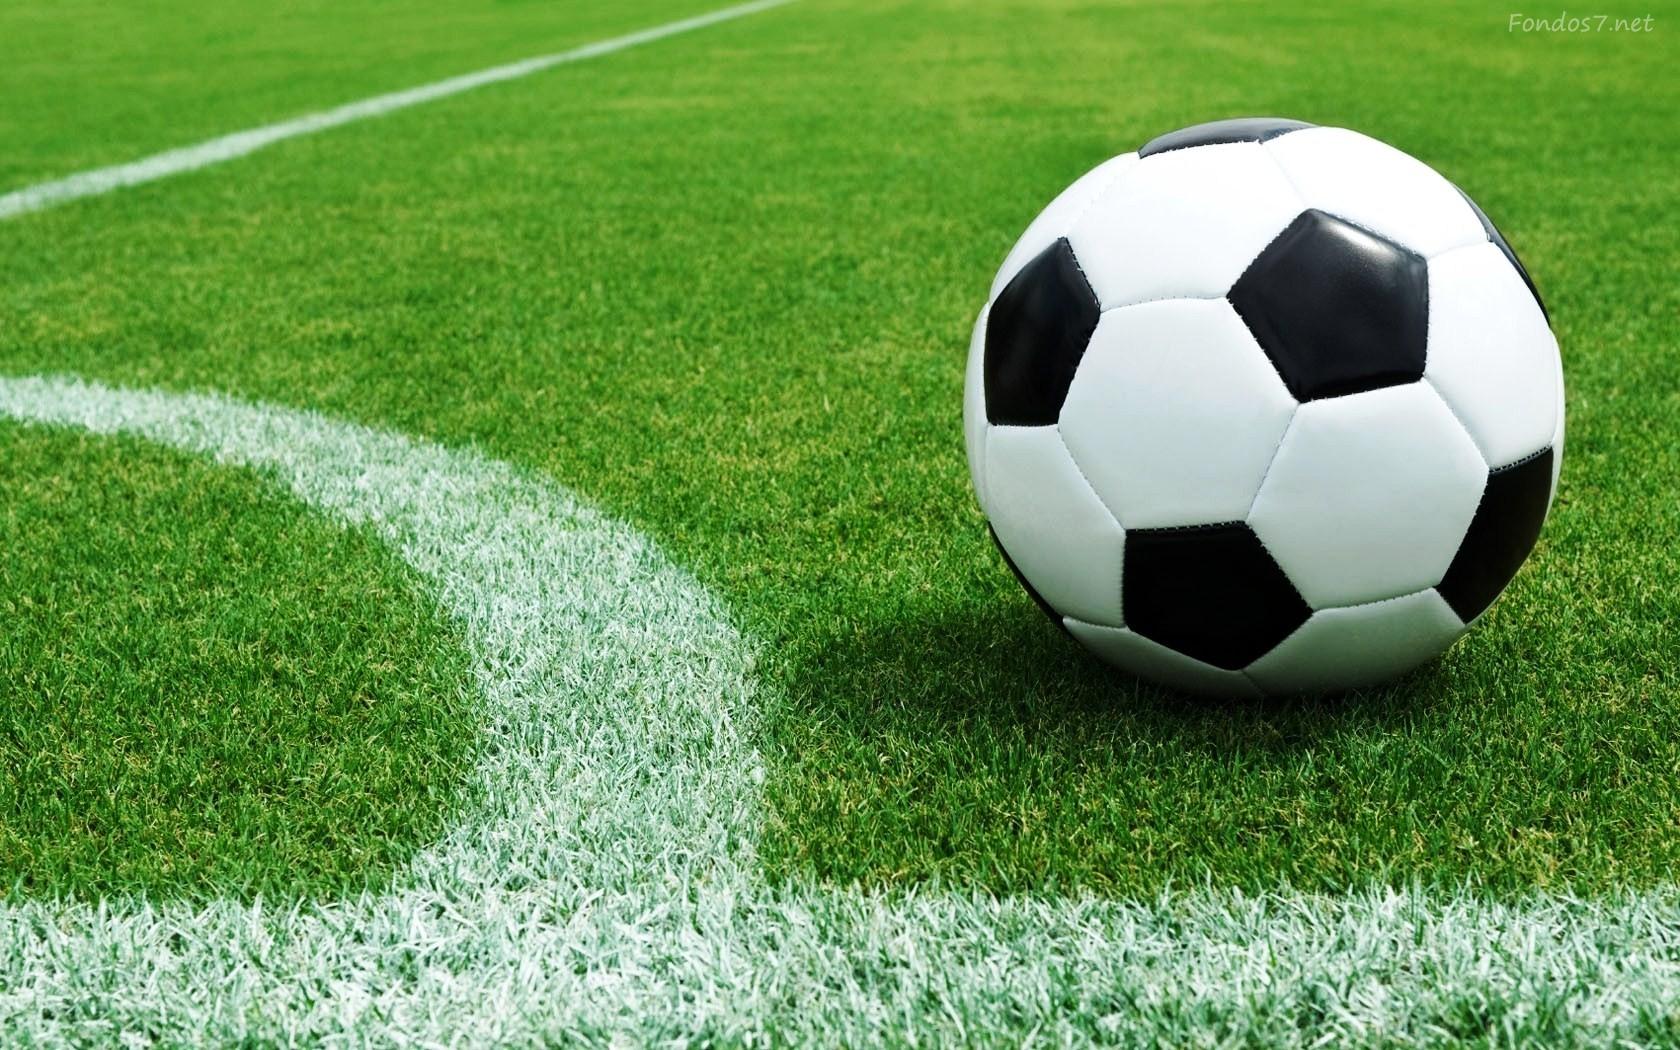 Norrby - IFK Varnamo maçı CANLI izle